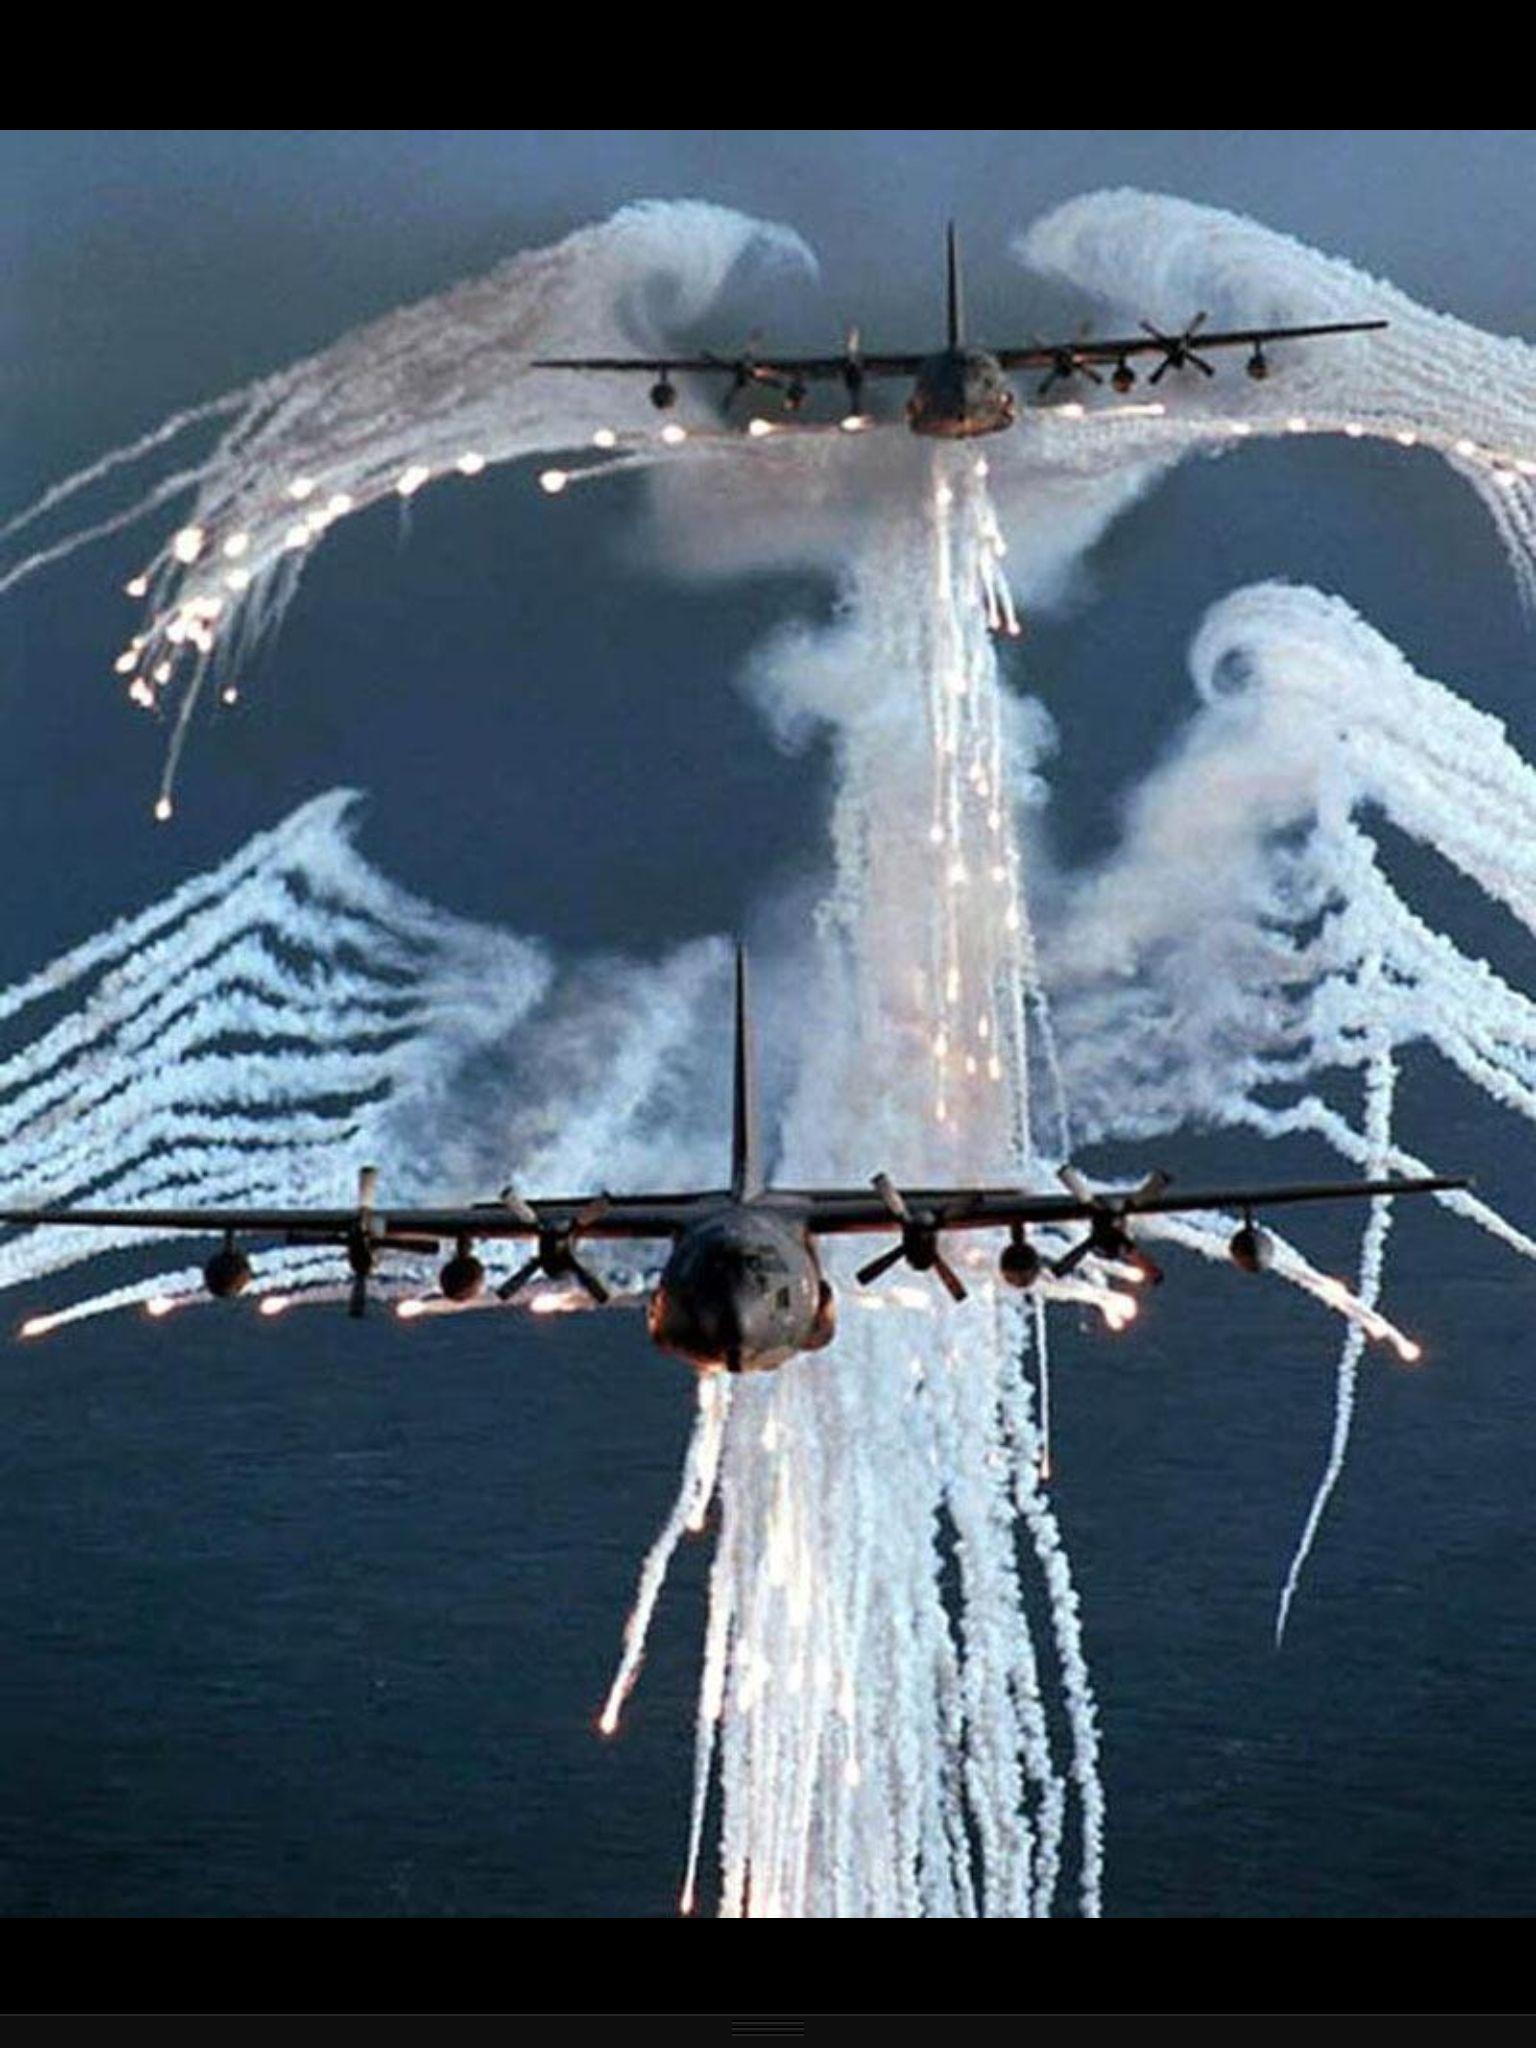 c130s firing their flares aka angel of death usa air force our